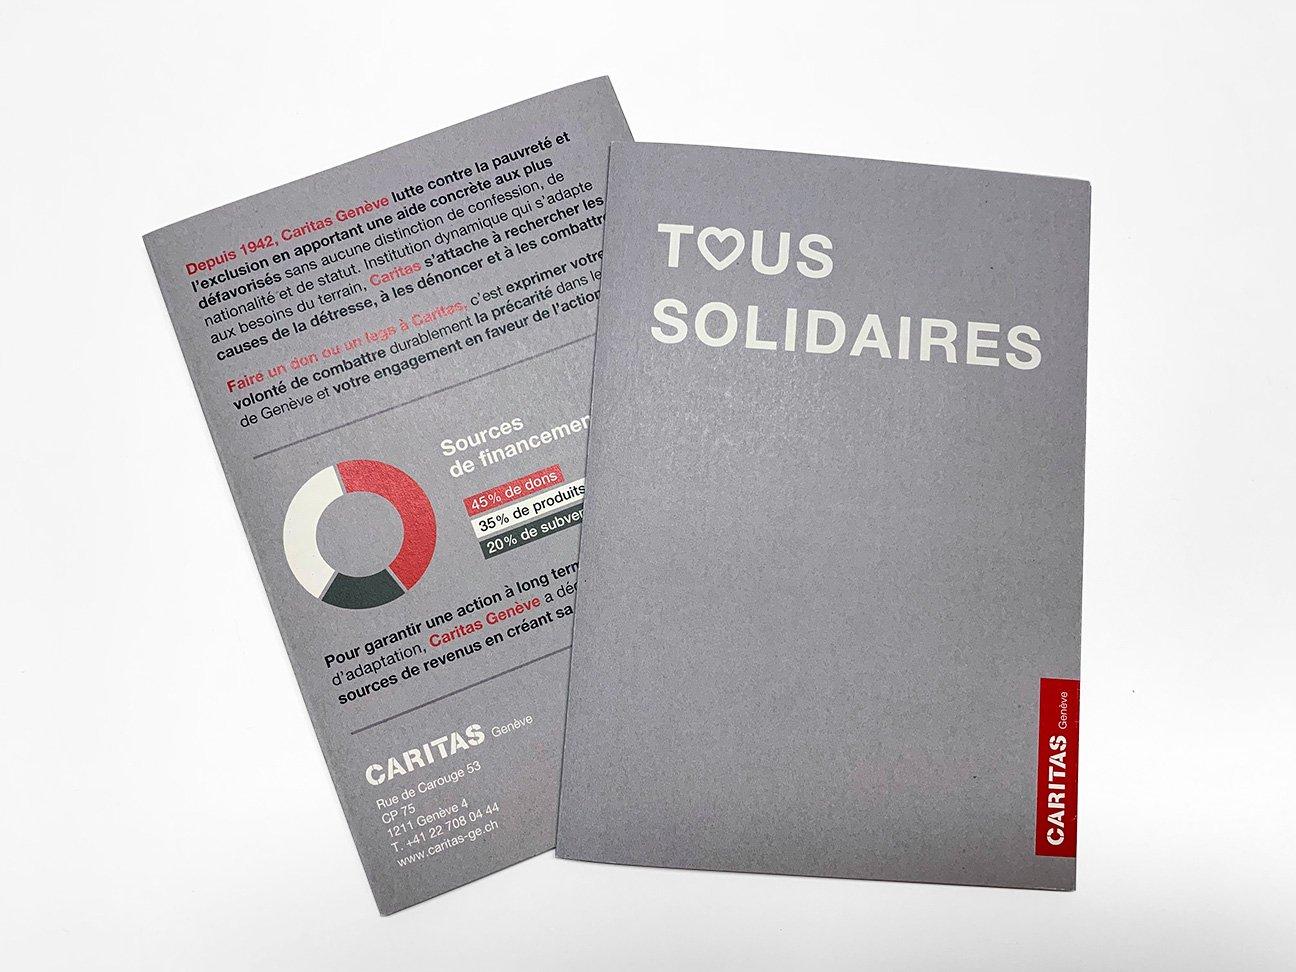 fabien_cuffel_graphisme_typographie_Brochure_Caritas_detail_Geneve_ok